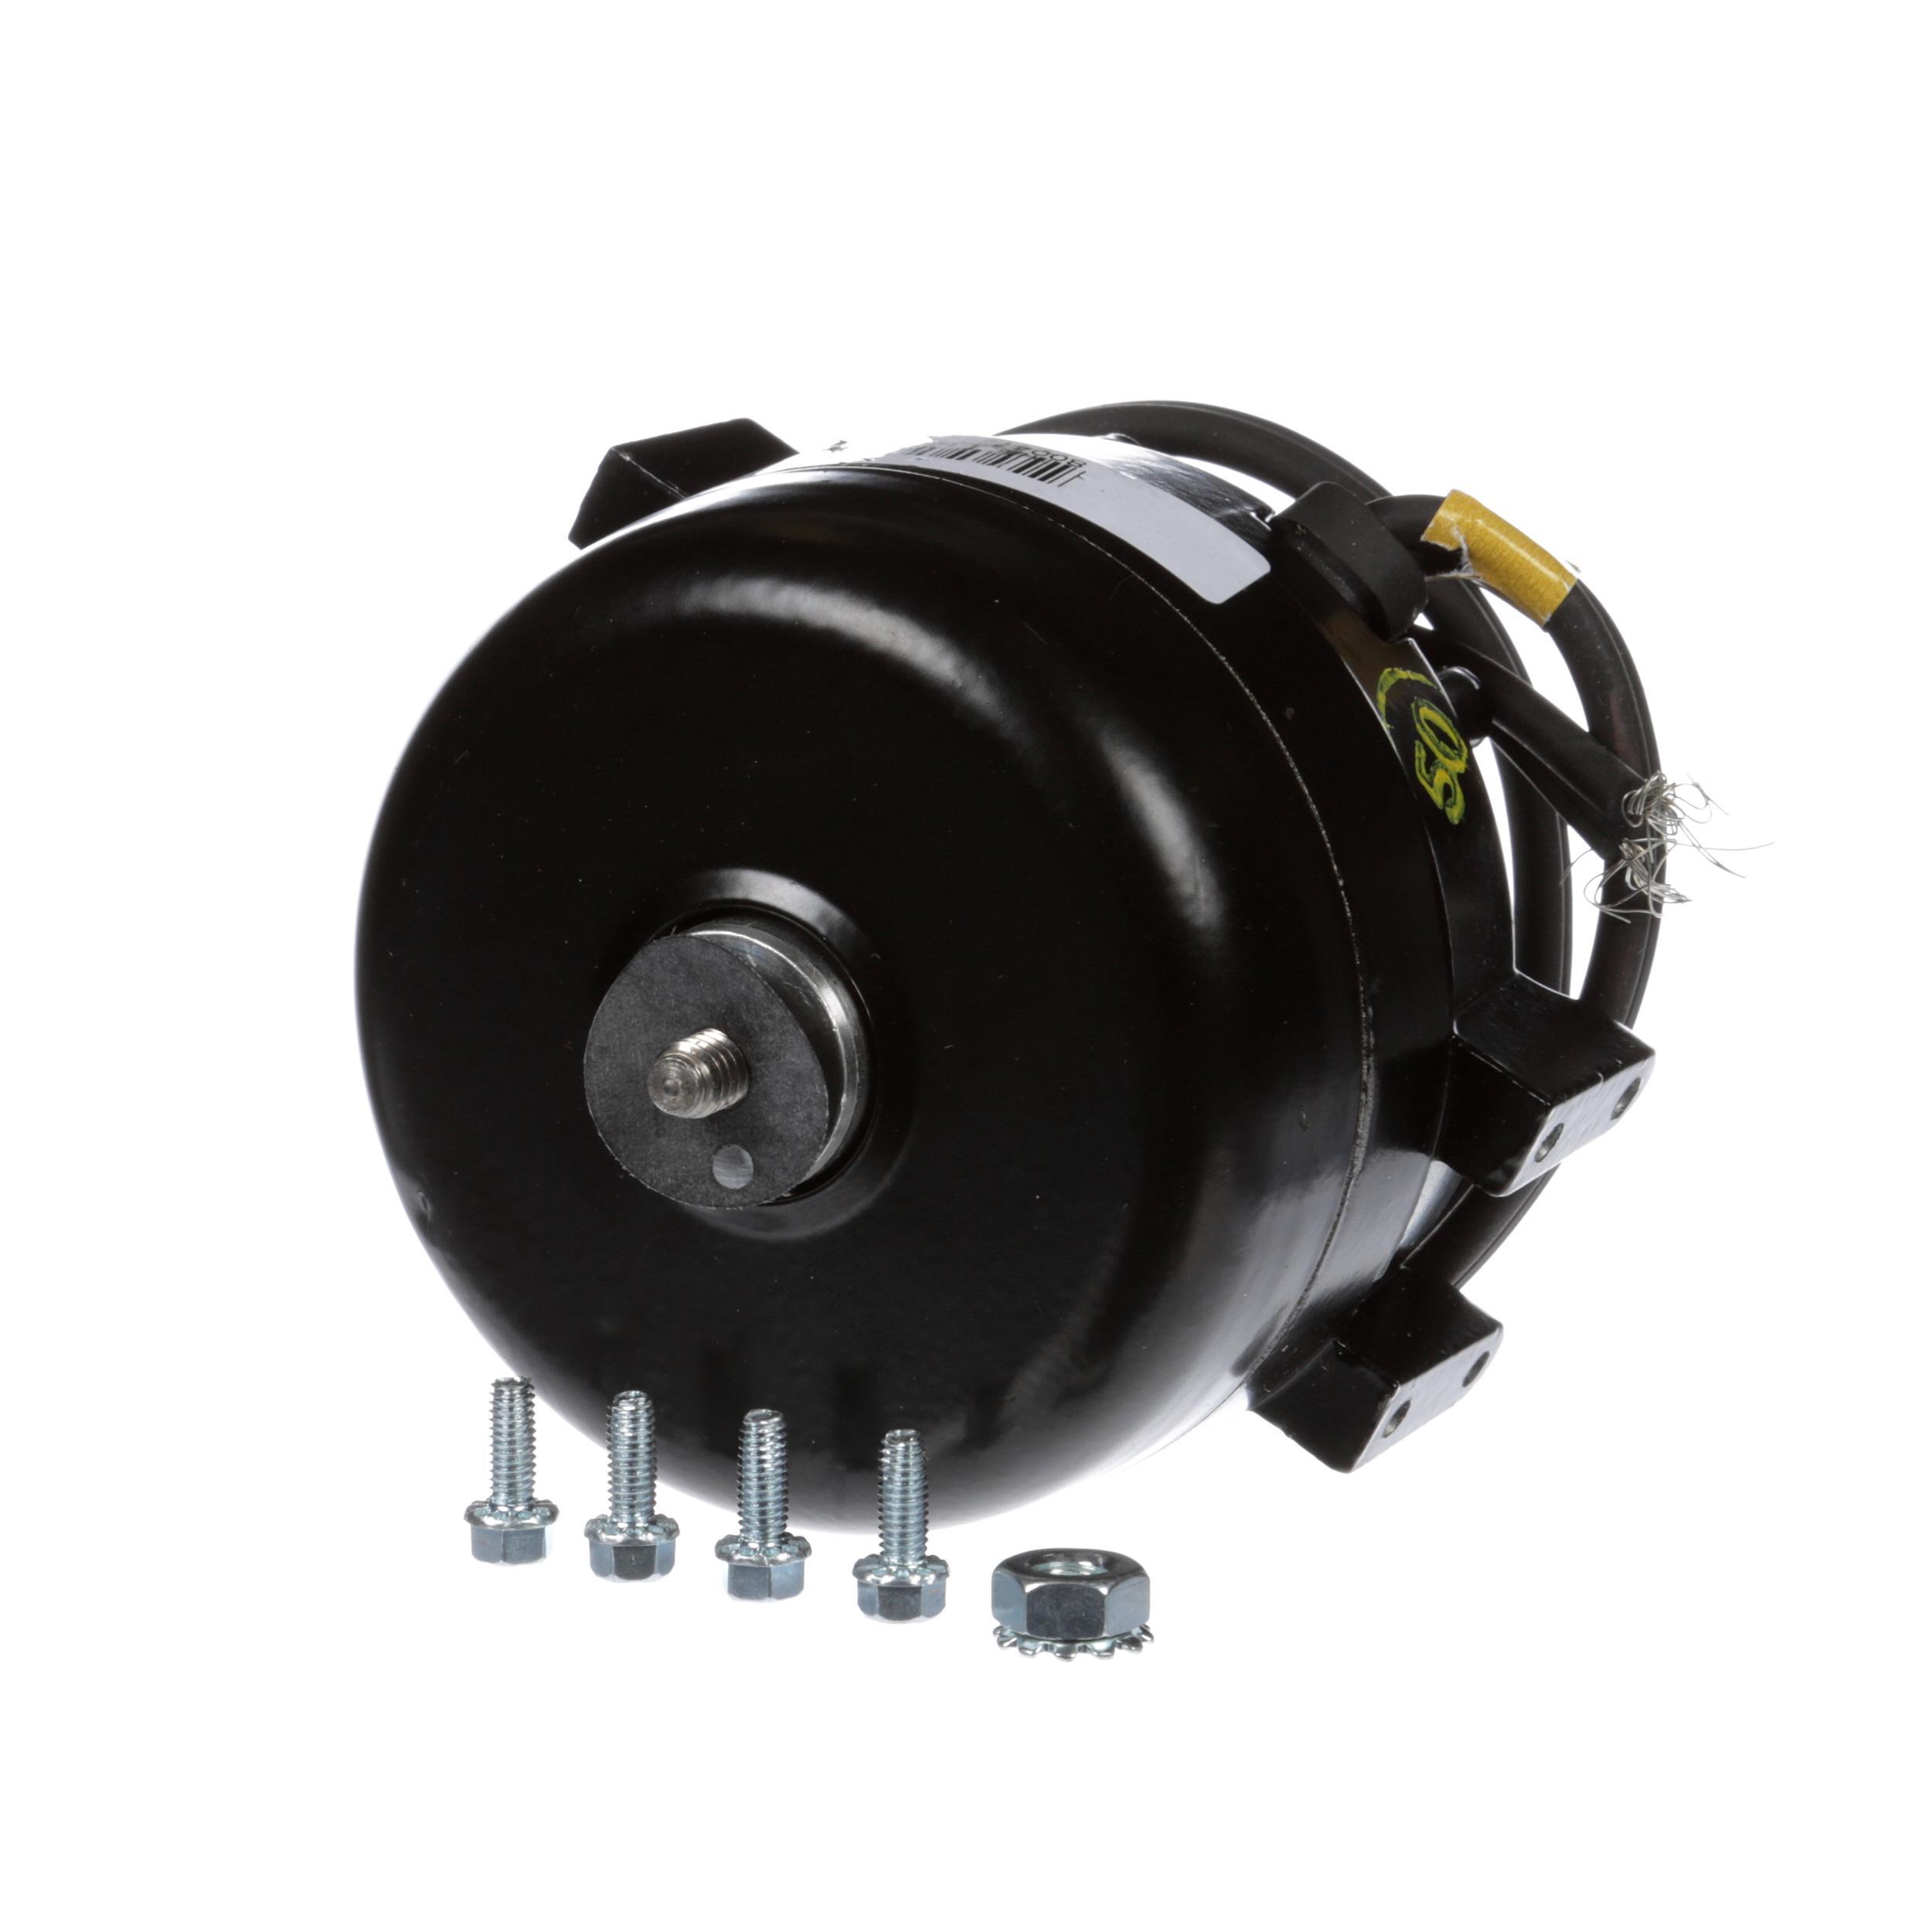 True Motor Psc4be6hs16 115v 60hz 6w 1550 Rpm Low Temp